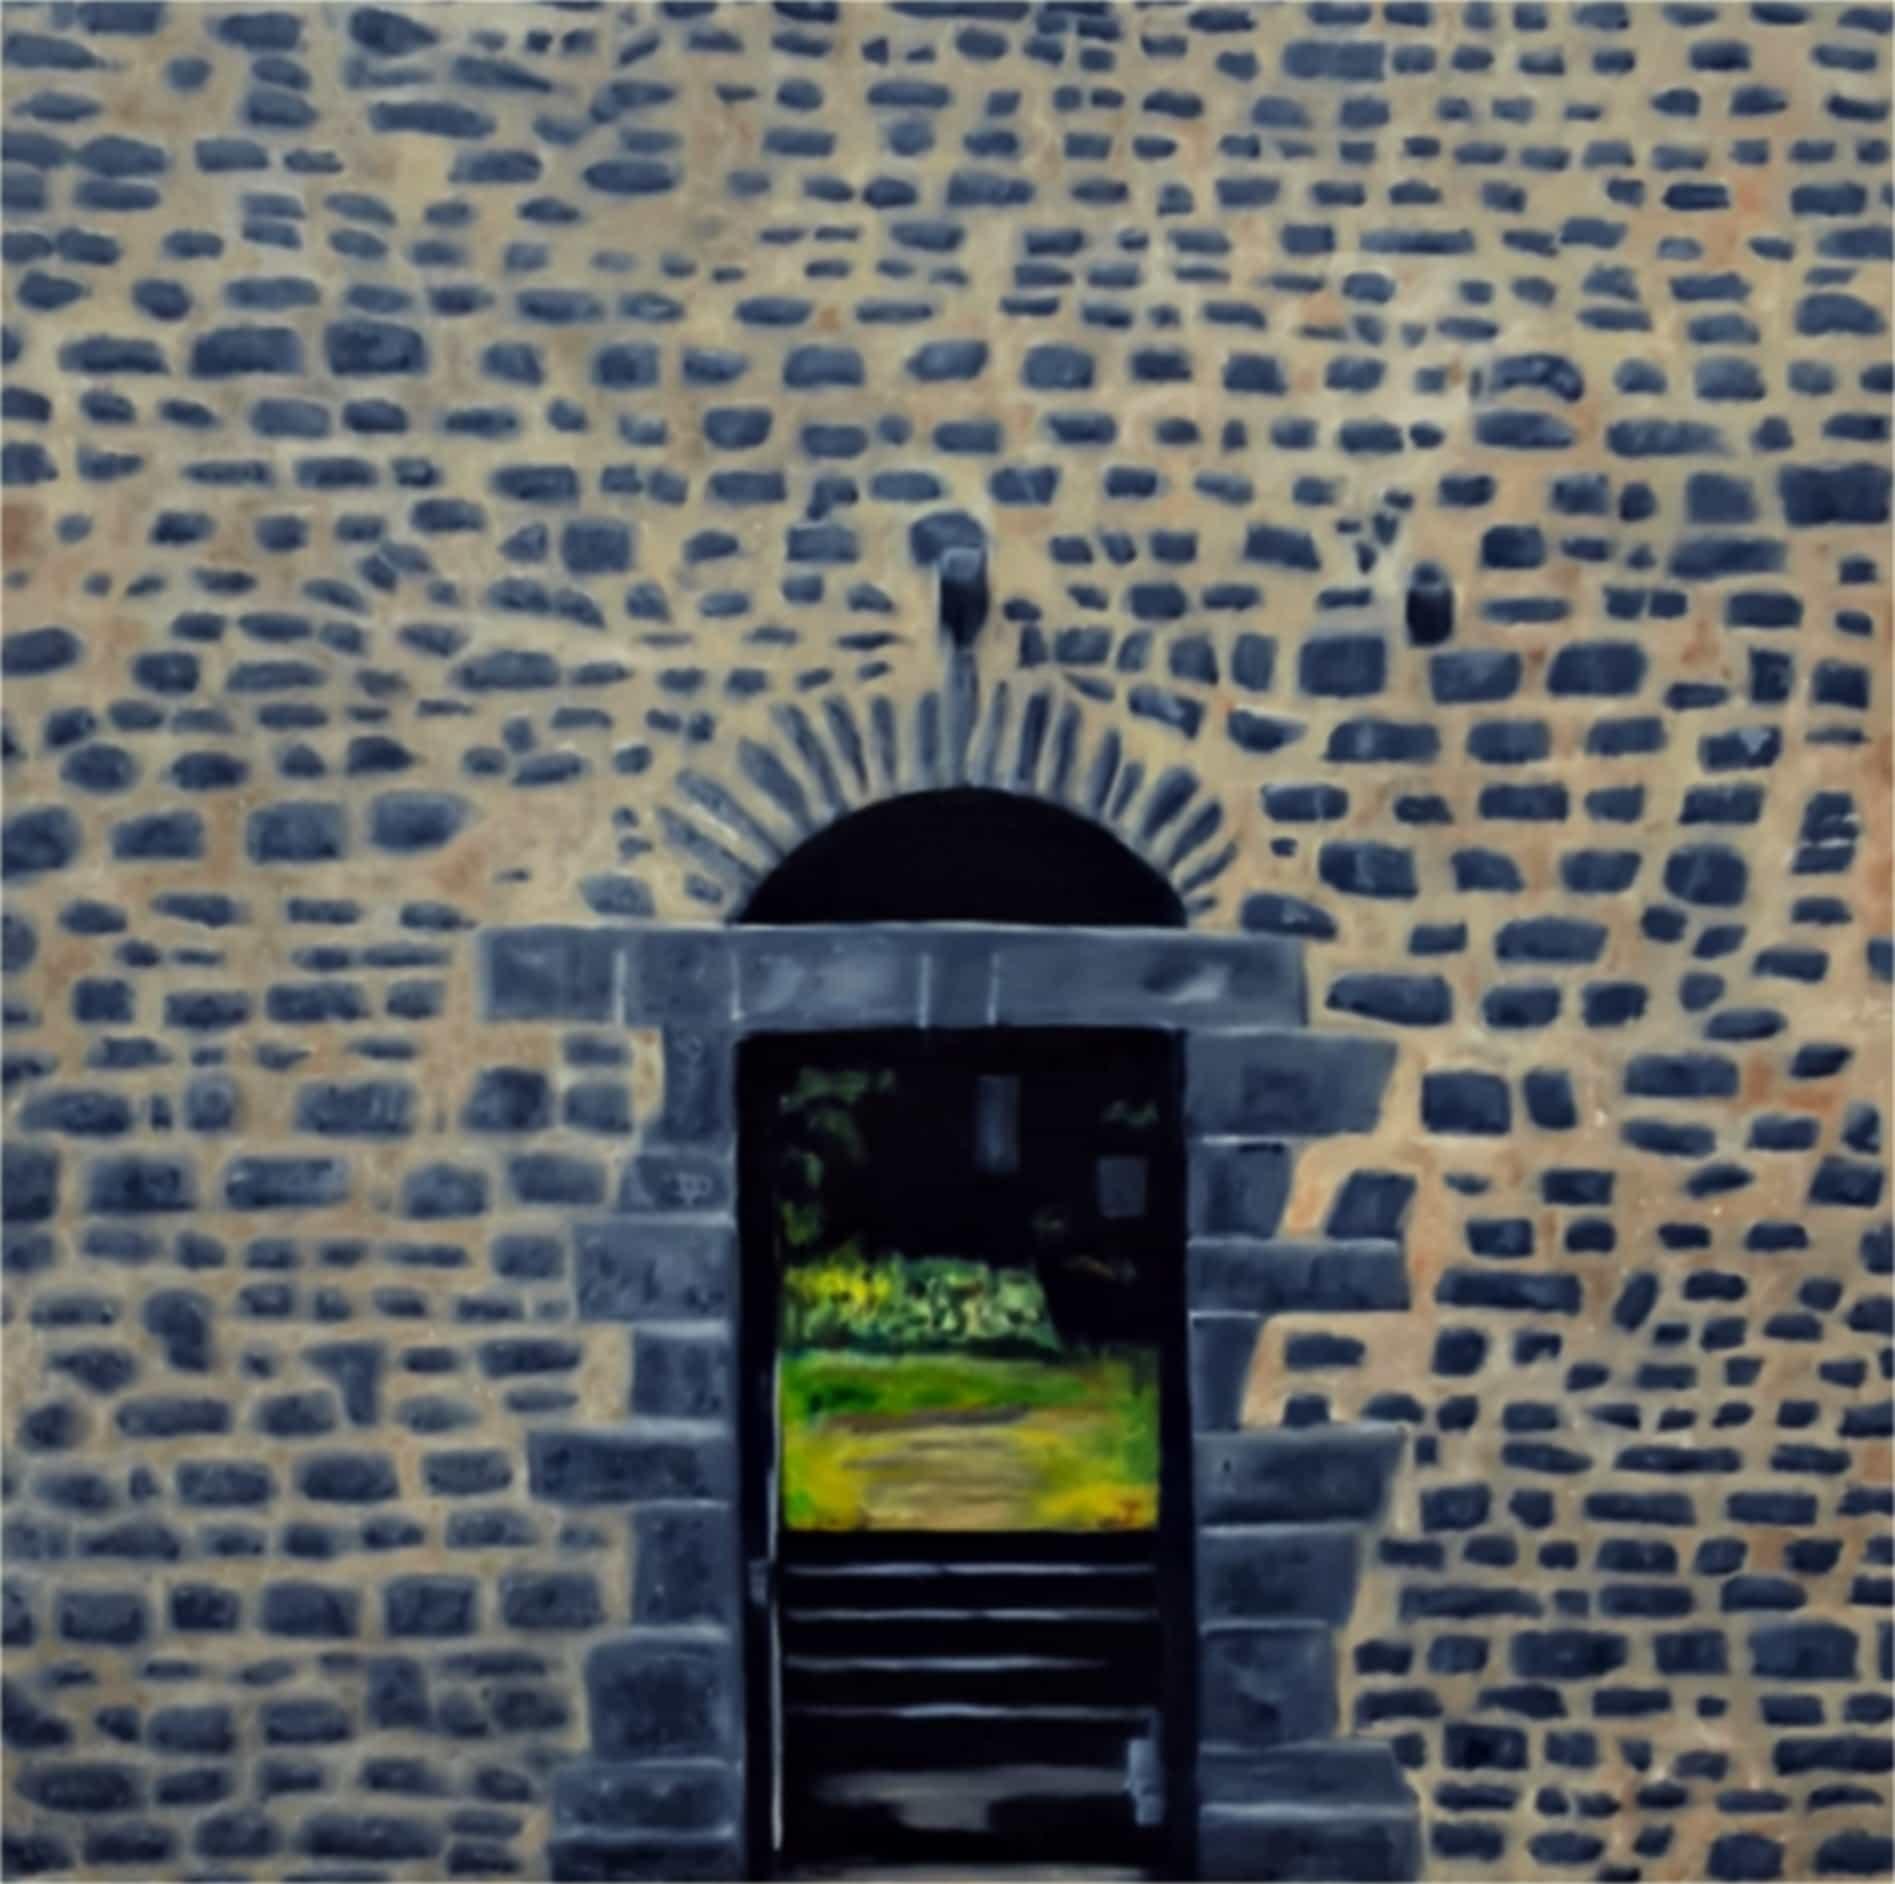 379 - Kloster Arnsburg